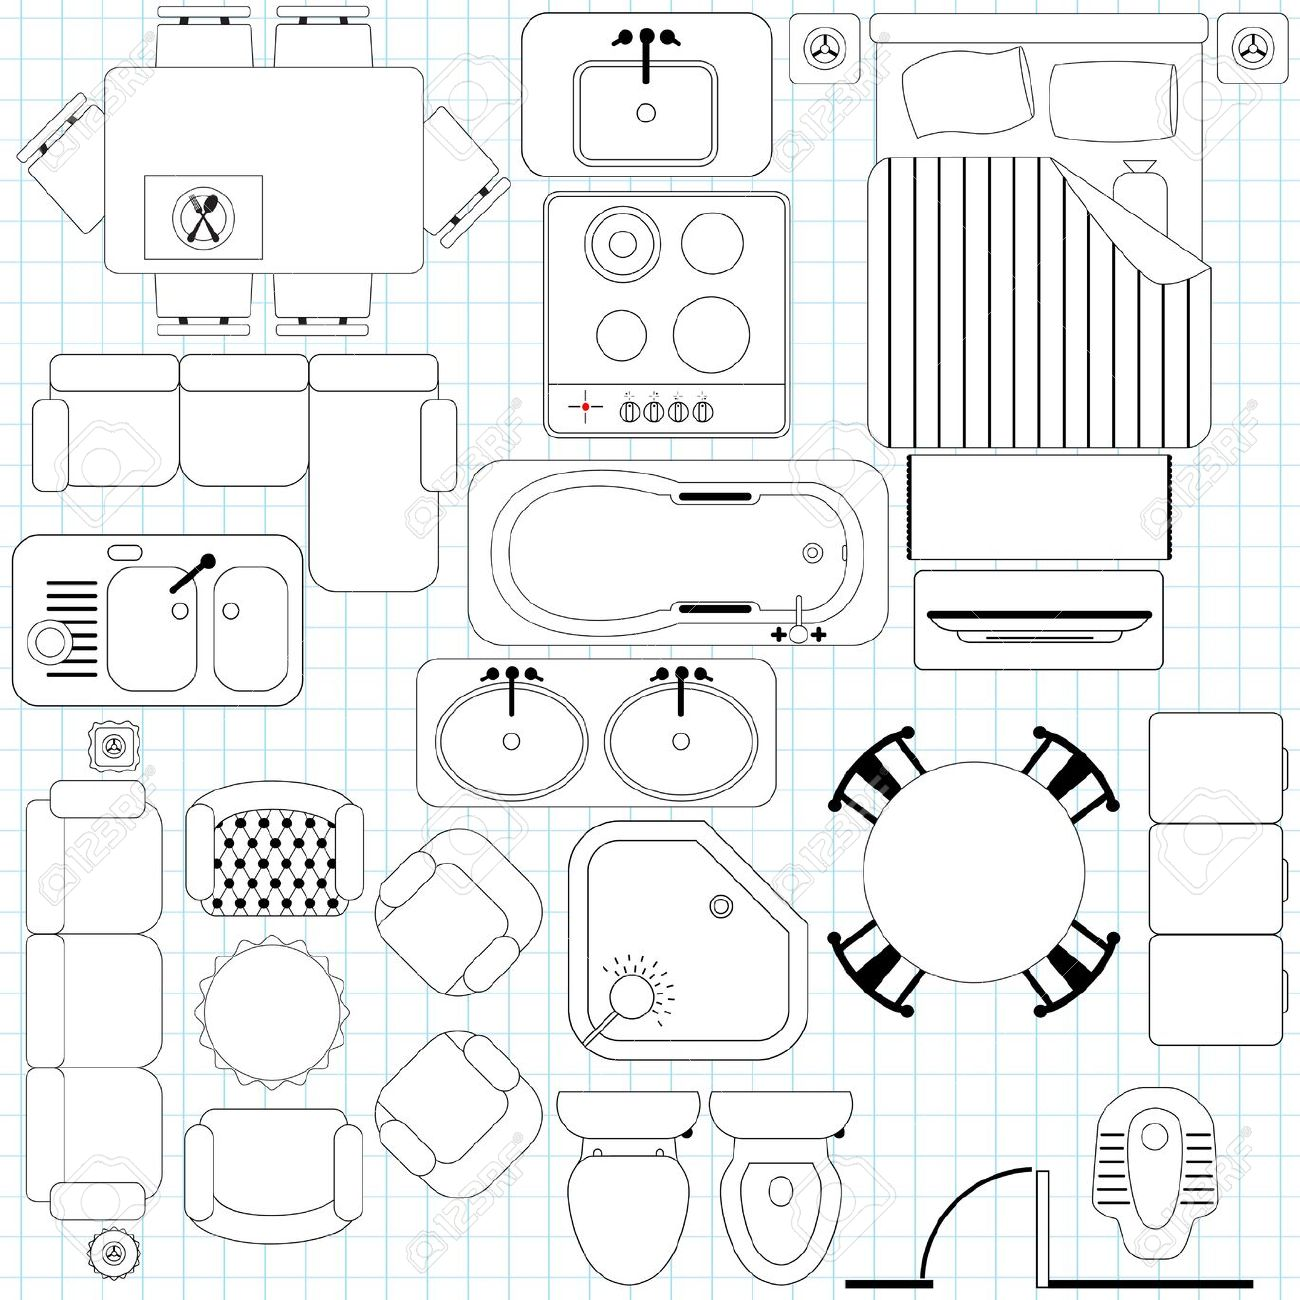 2d Floor Plan Symbols Free